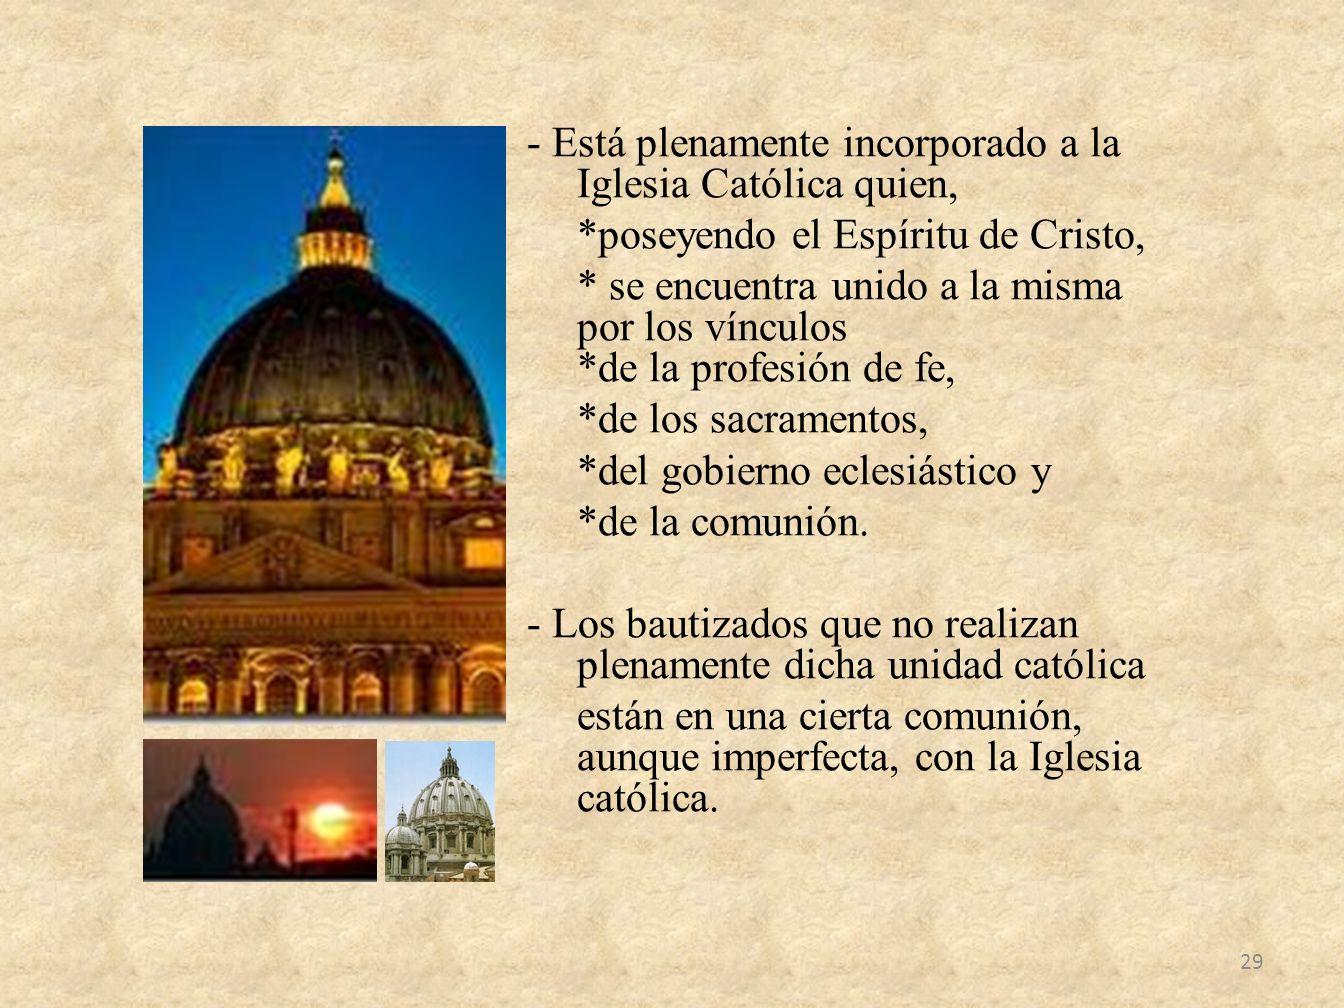 - Está plenamente incorporado a la Iglesia Católica quien,